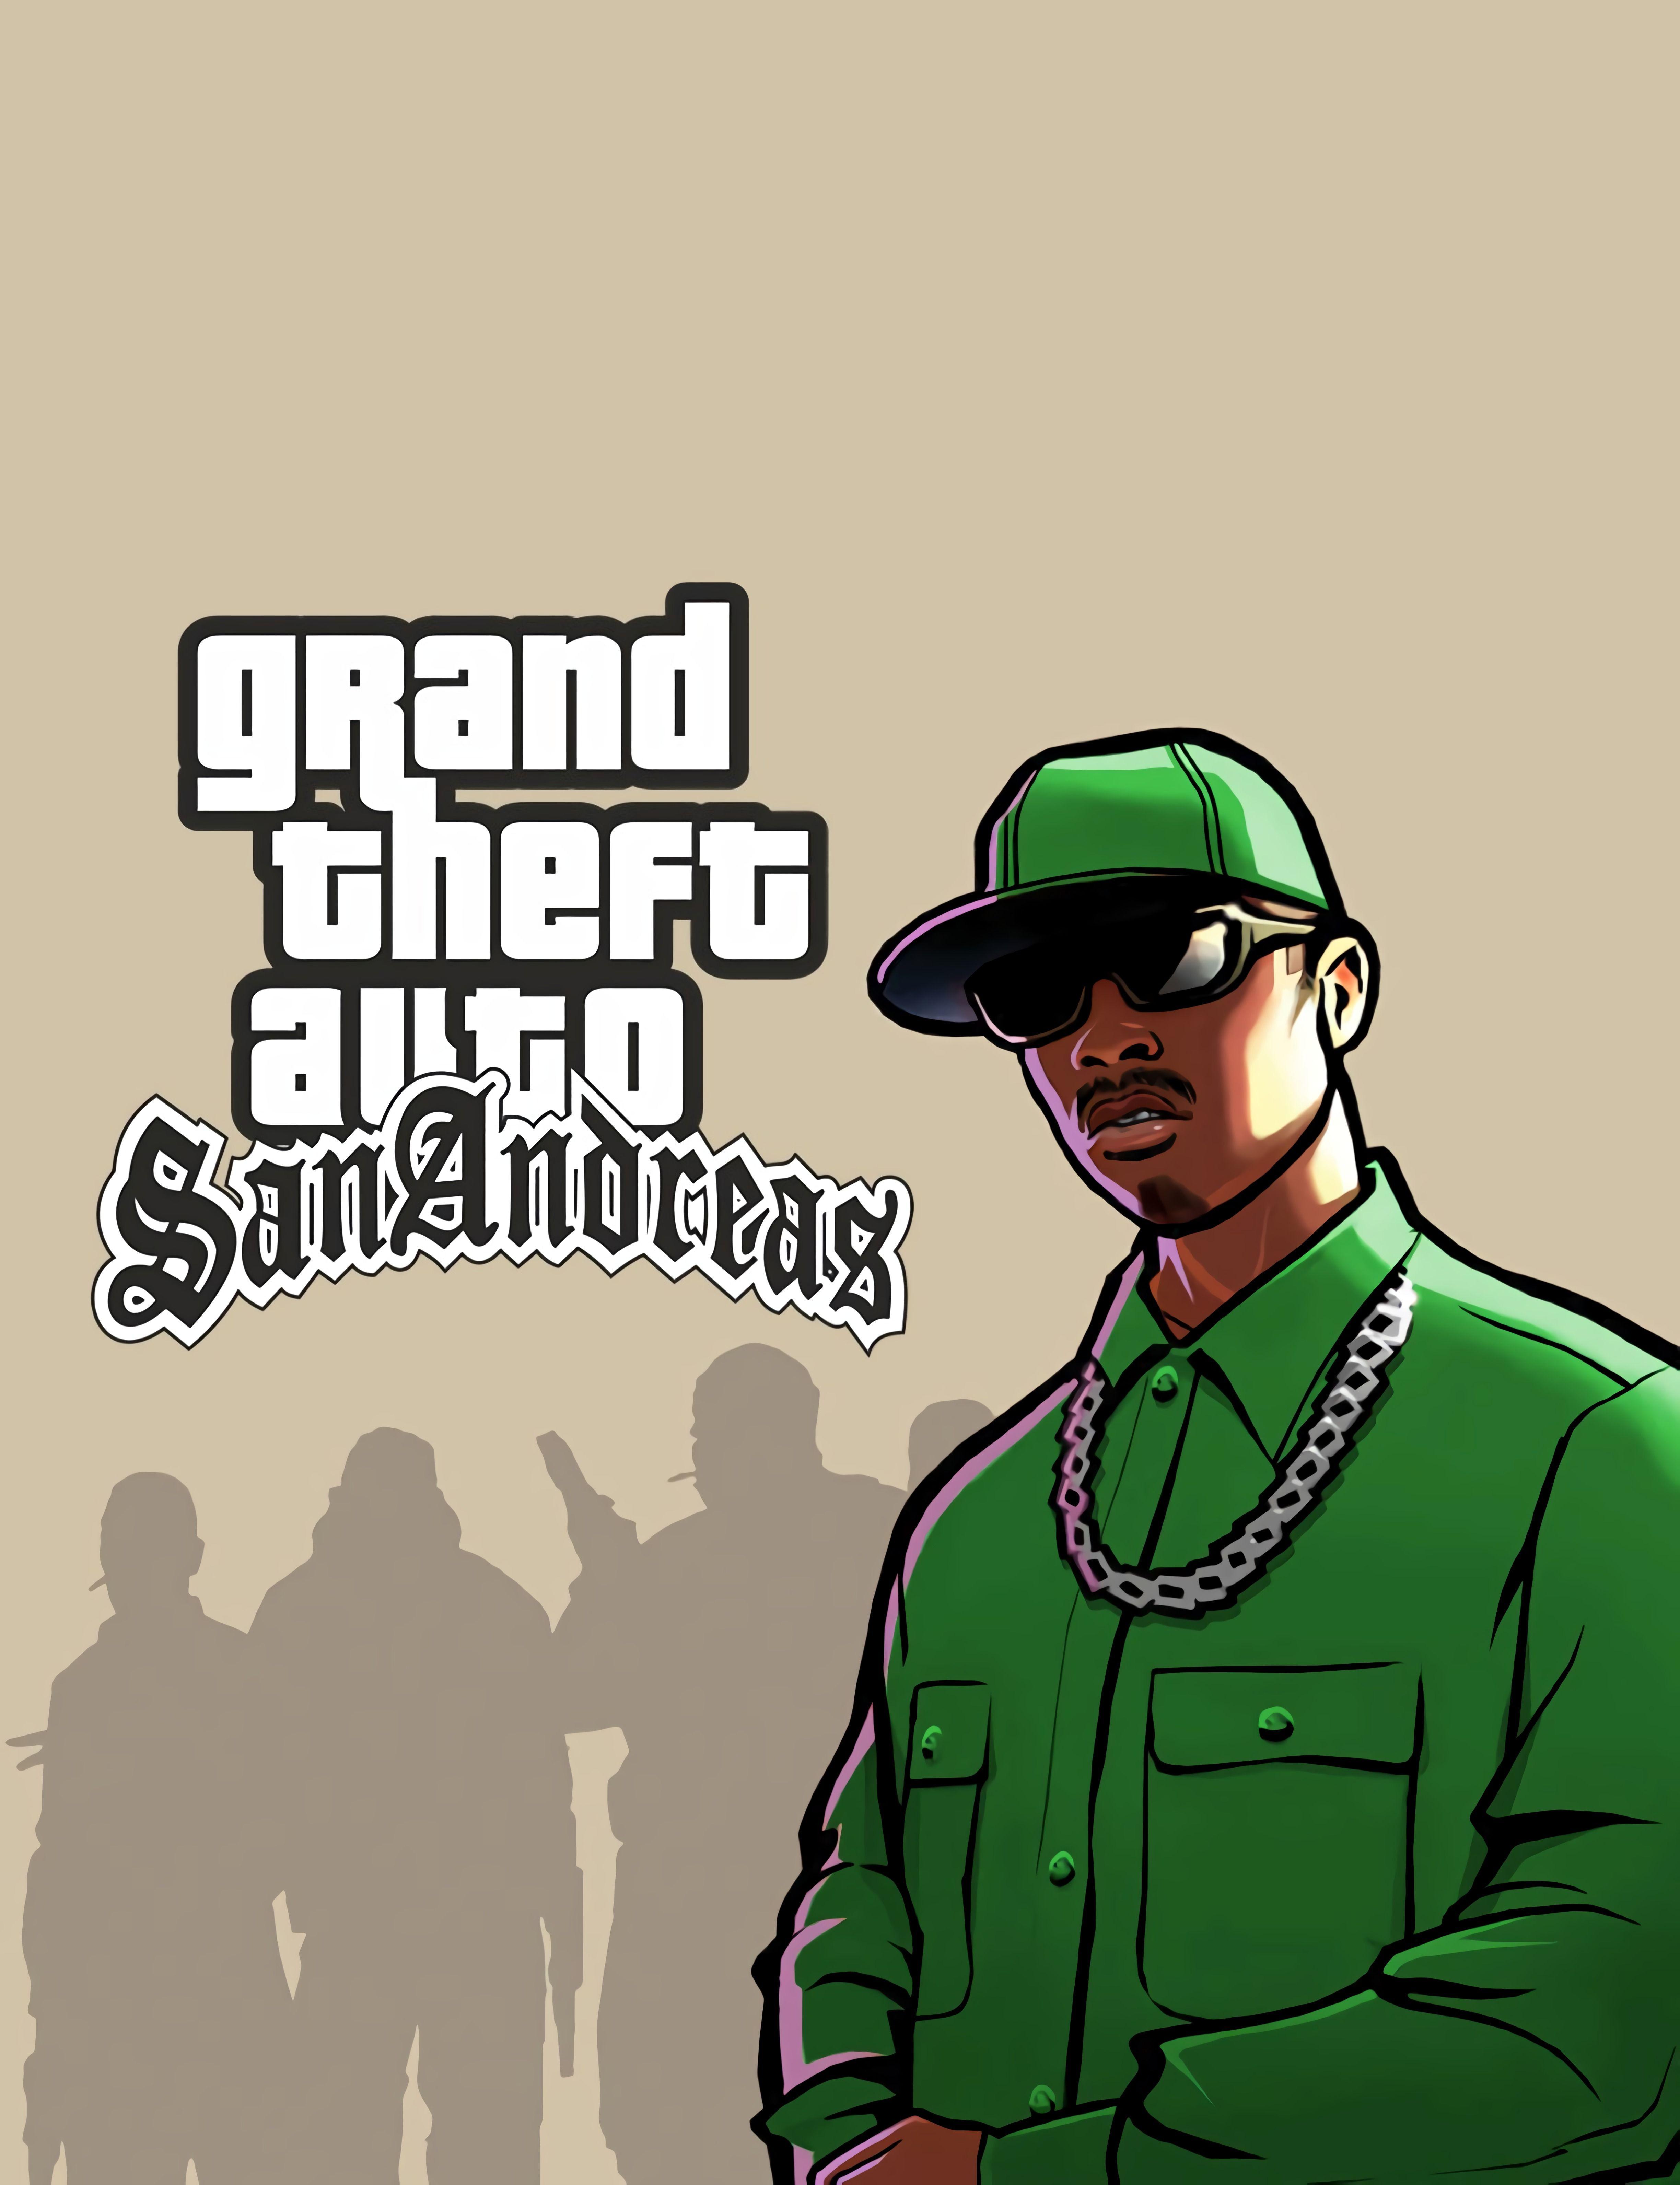 Gta San Andreas C J In The Nightclub By Tiagootaku59 On Deviantart San Andreas Gta Grand Theft Auto Artwork San Andreas Grand Theft Auto